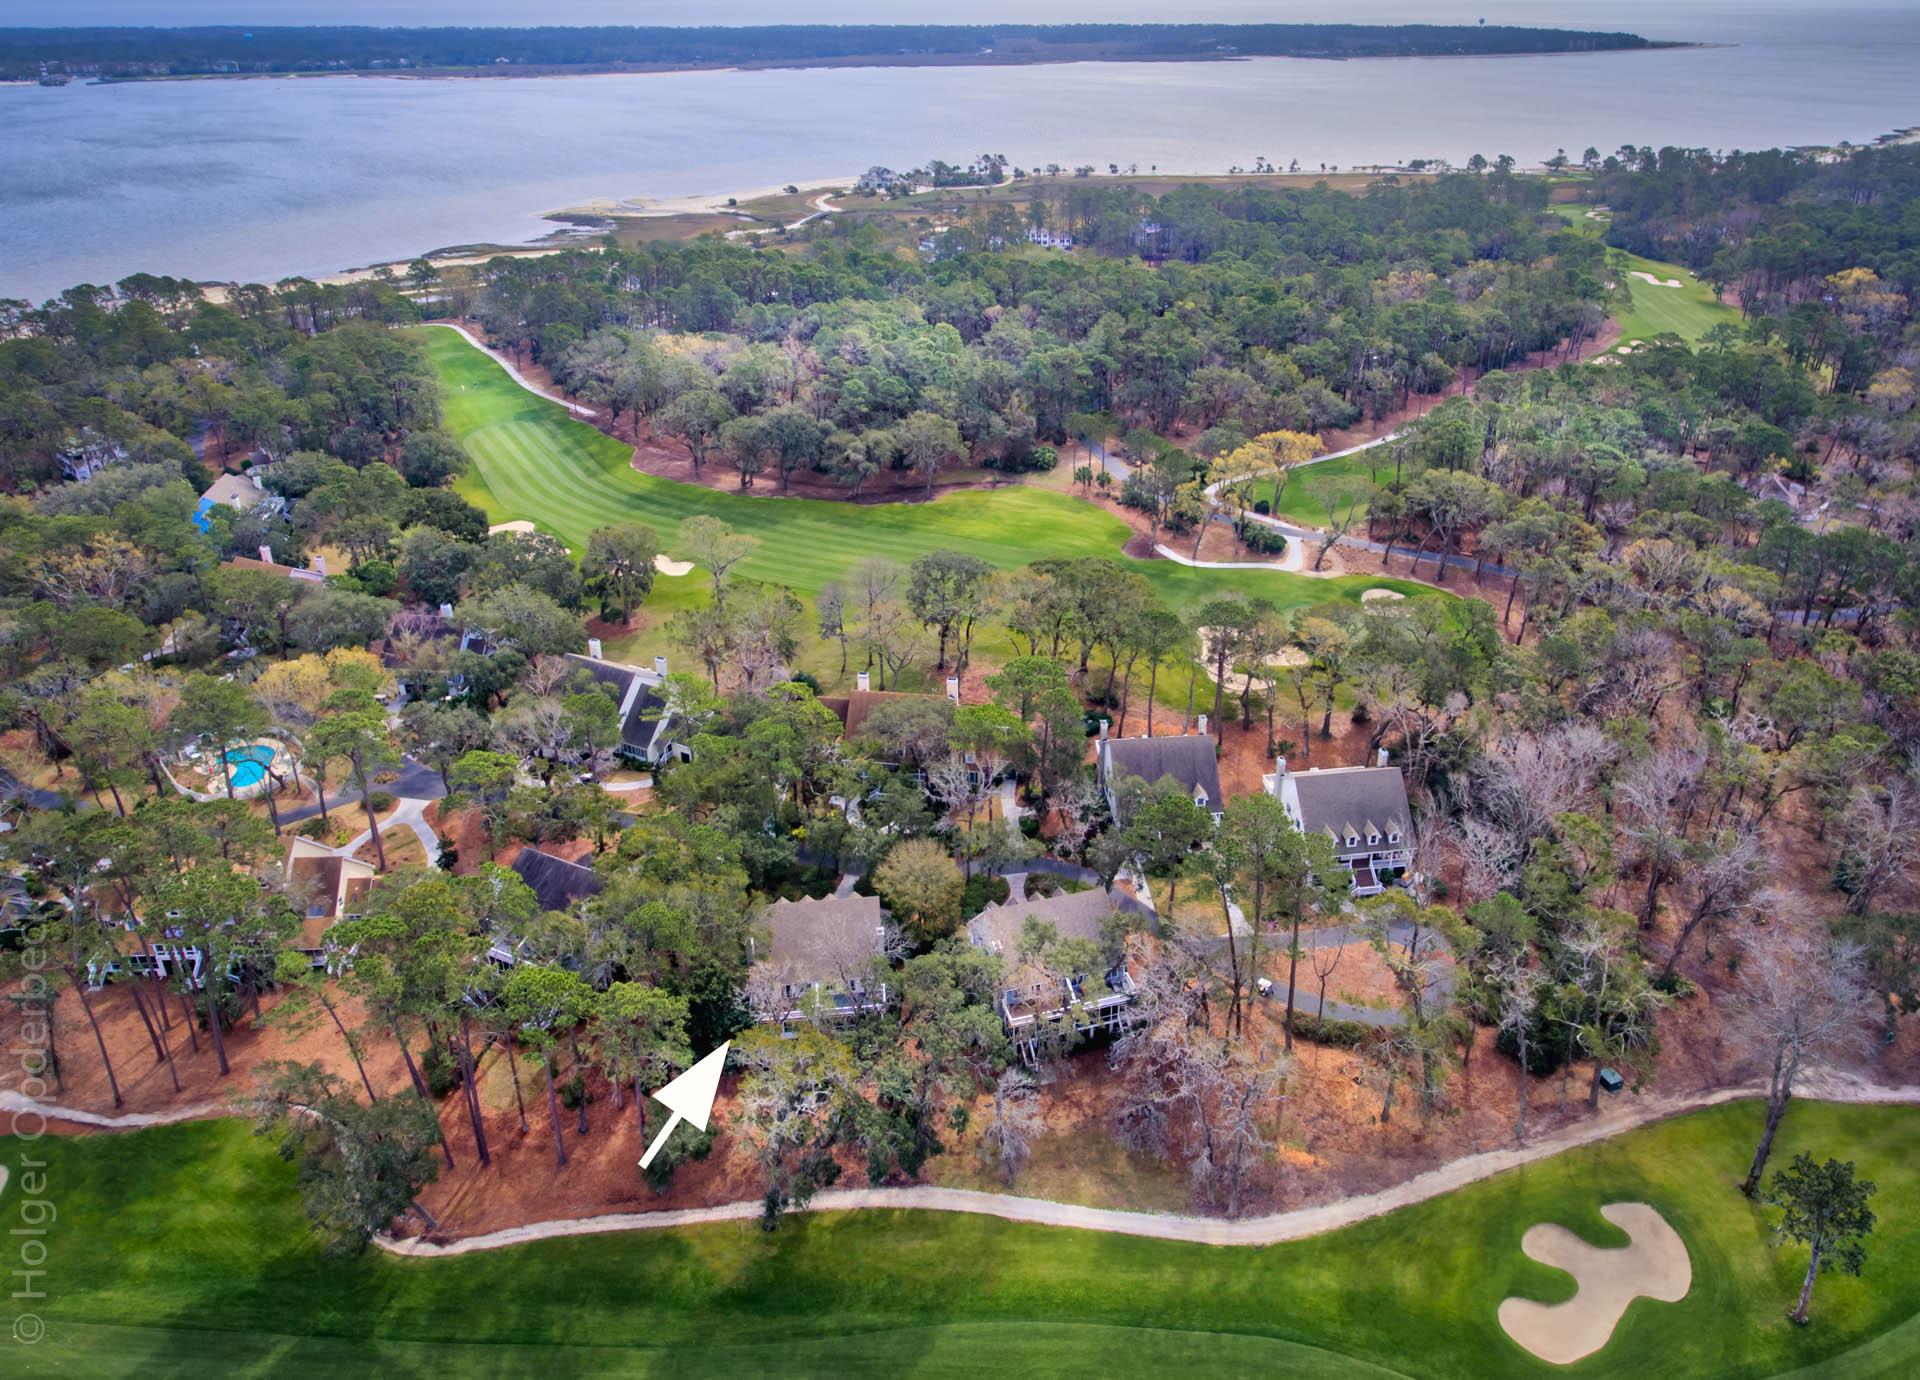 drone-view-plantation-30.jpg